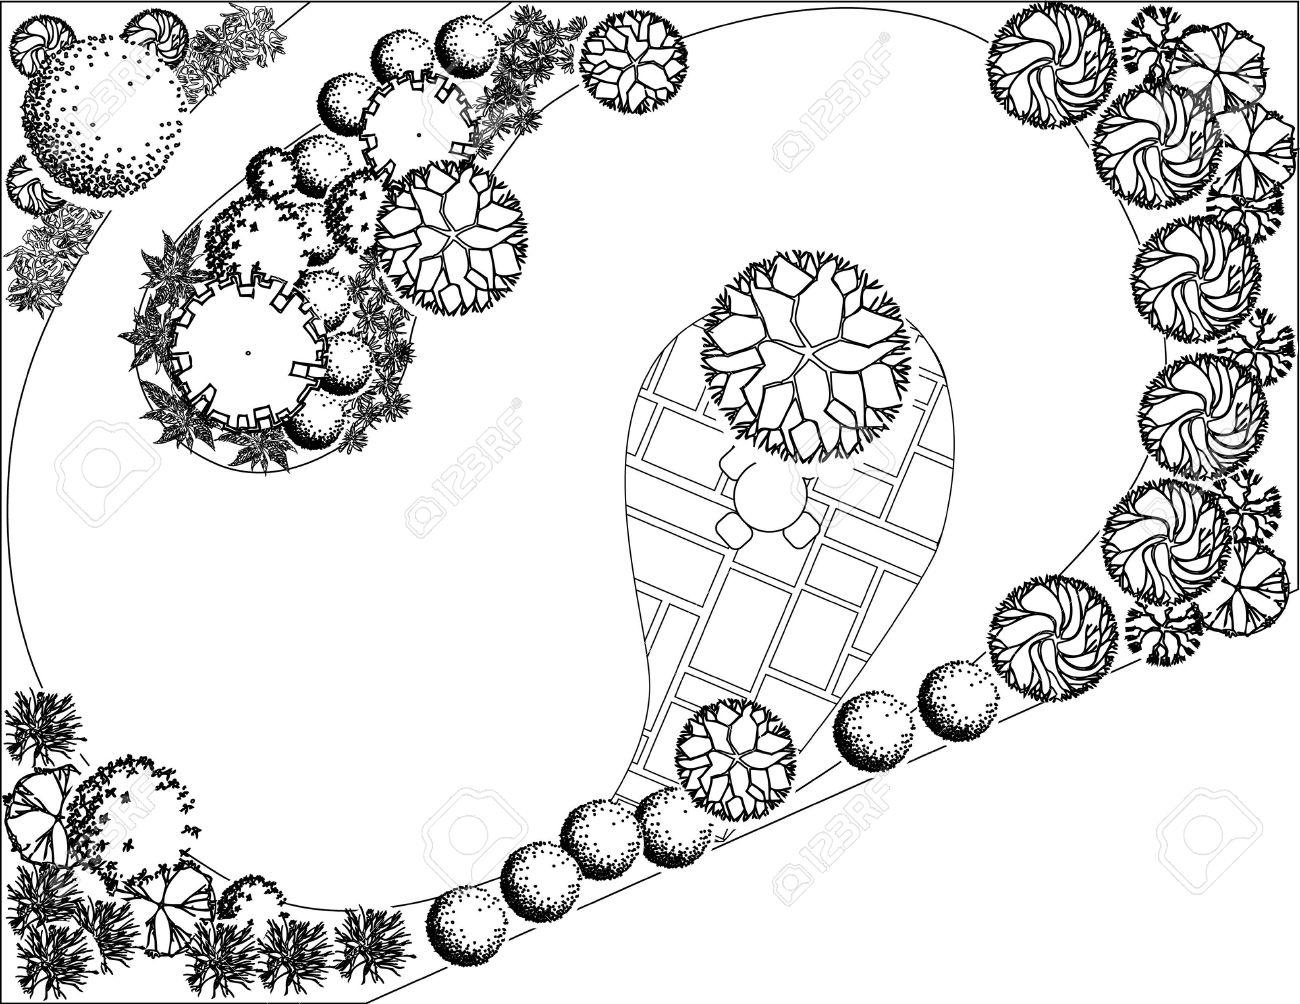 Plan of garden with symbols of tree Stock Vector - 12490422